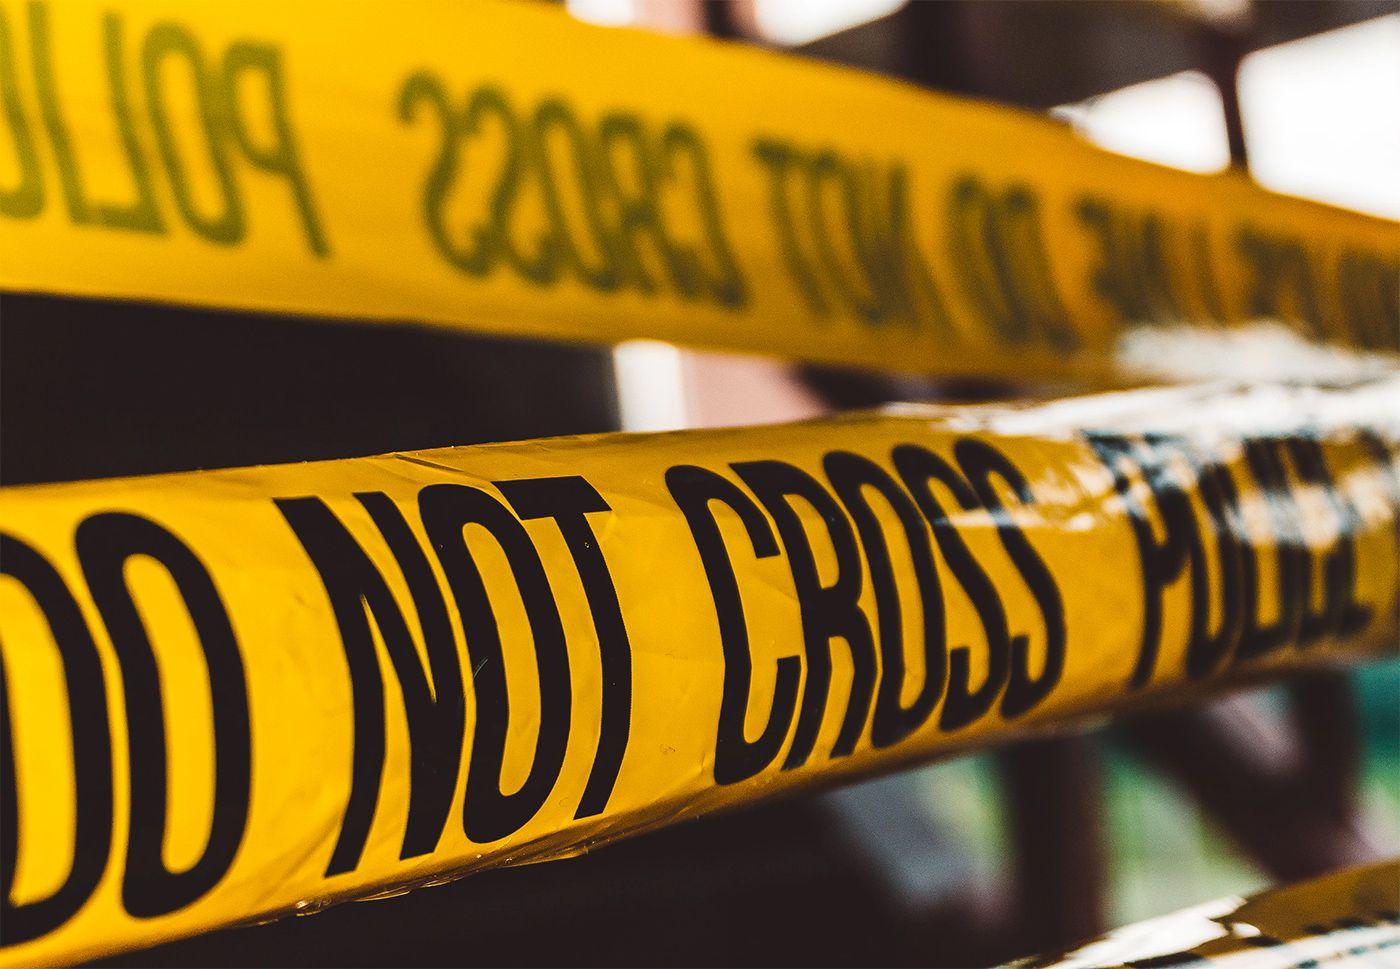 50-Year-Old Man Fatally Shot In Bayview